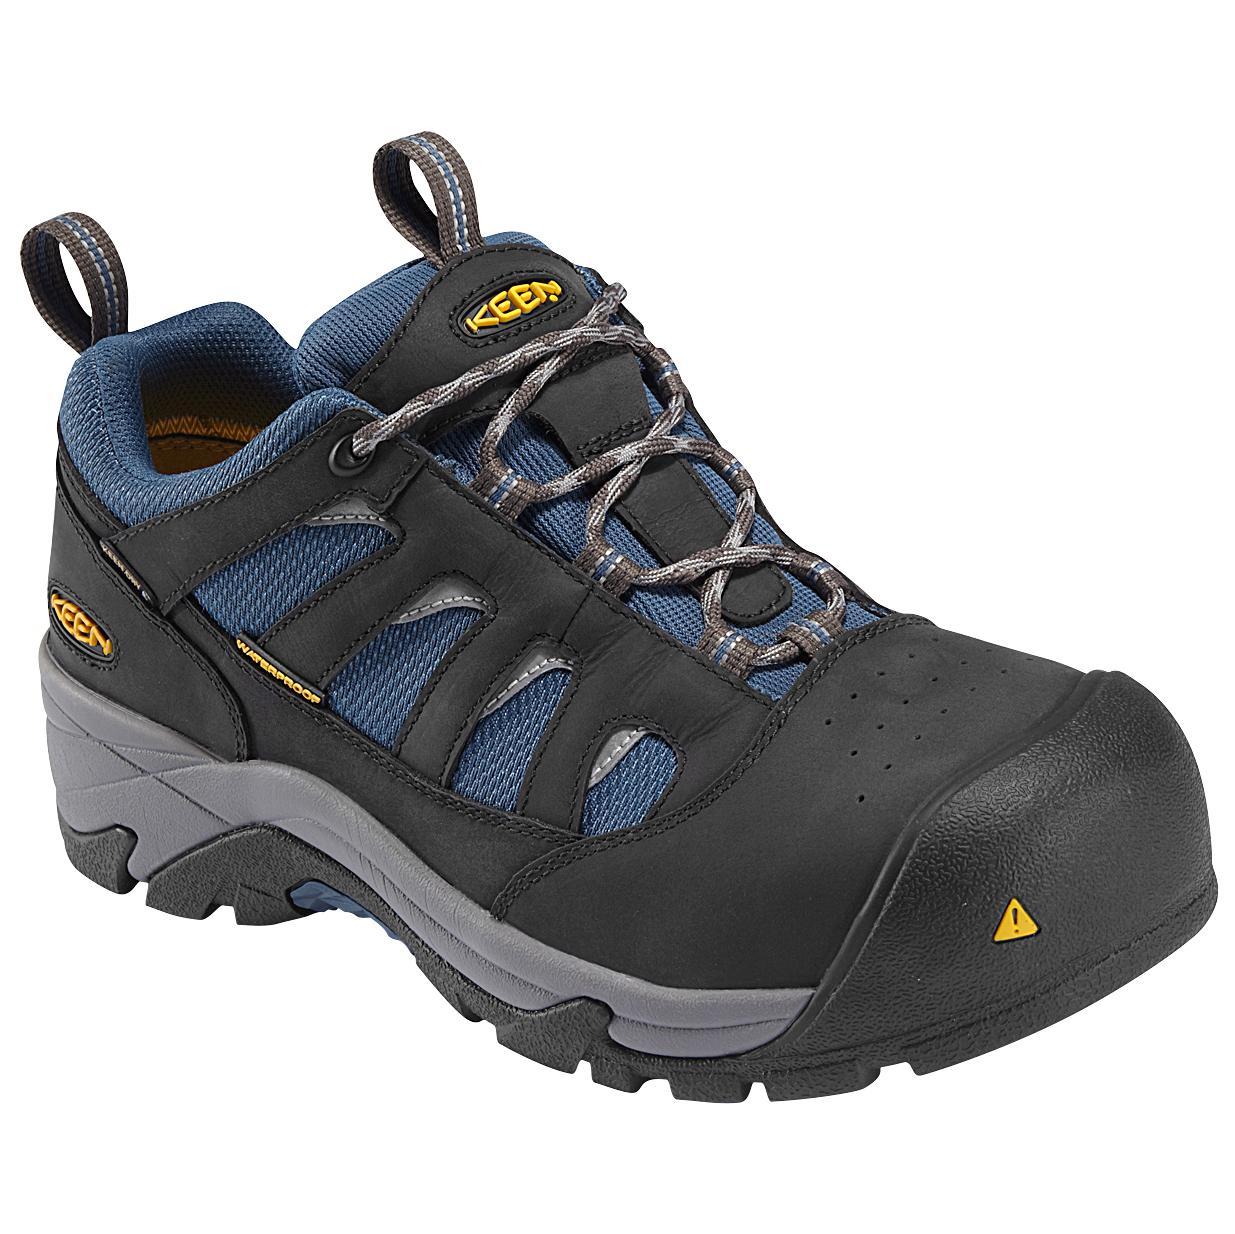 Keen Black Work Shoes